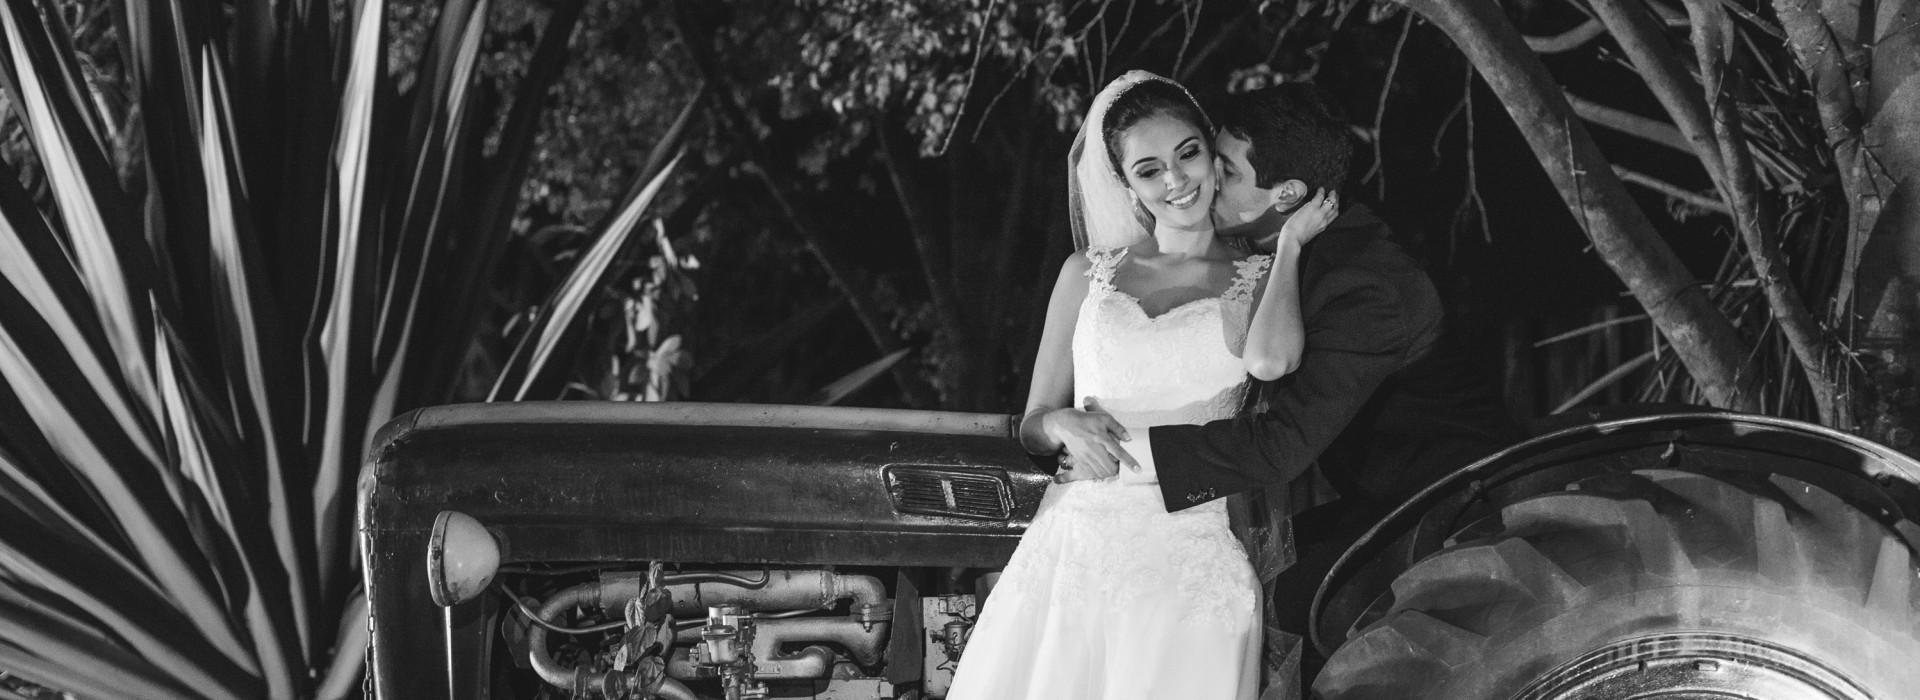 Casamento de Isabella e Lucas em Volta Redonda - RJ